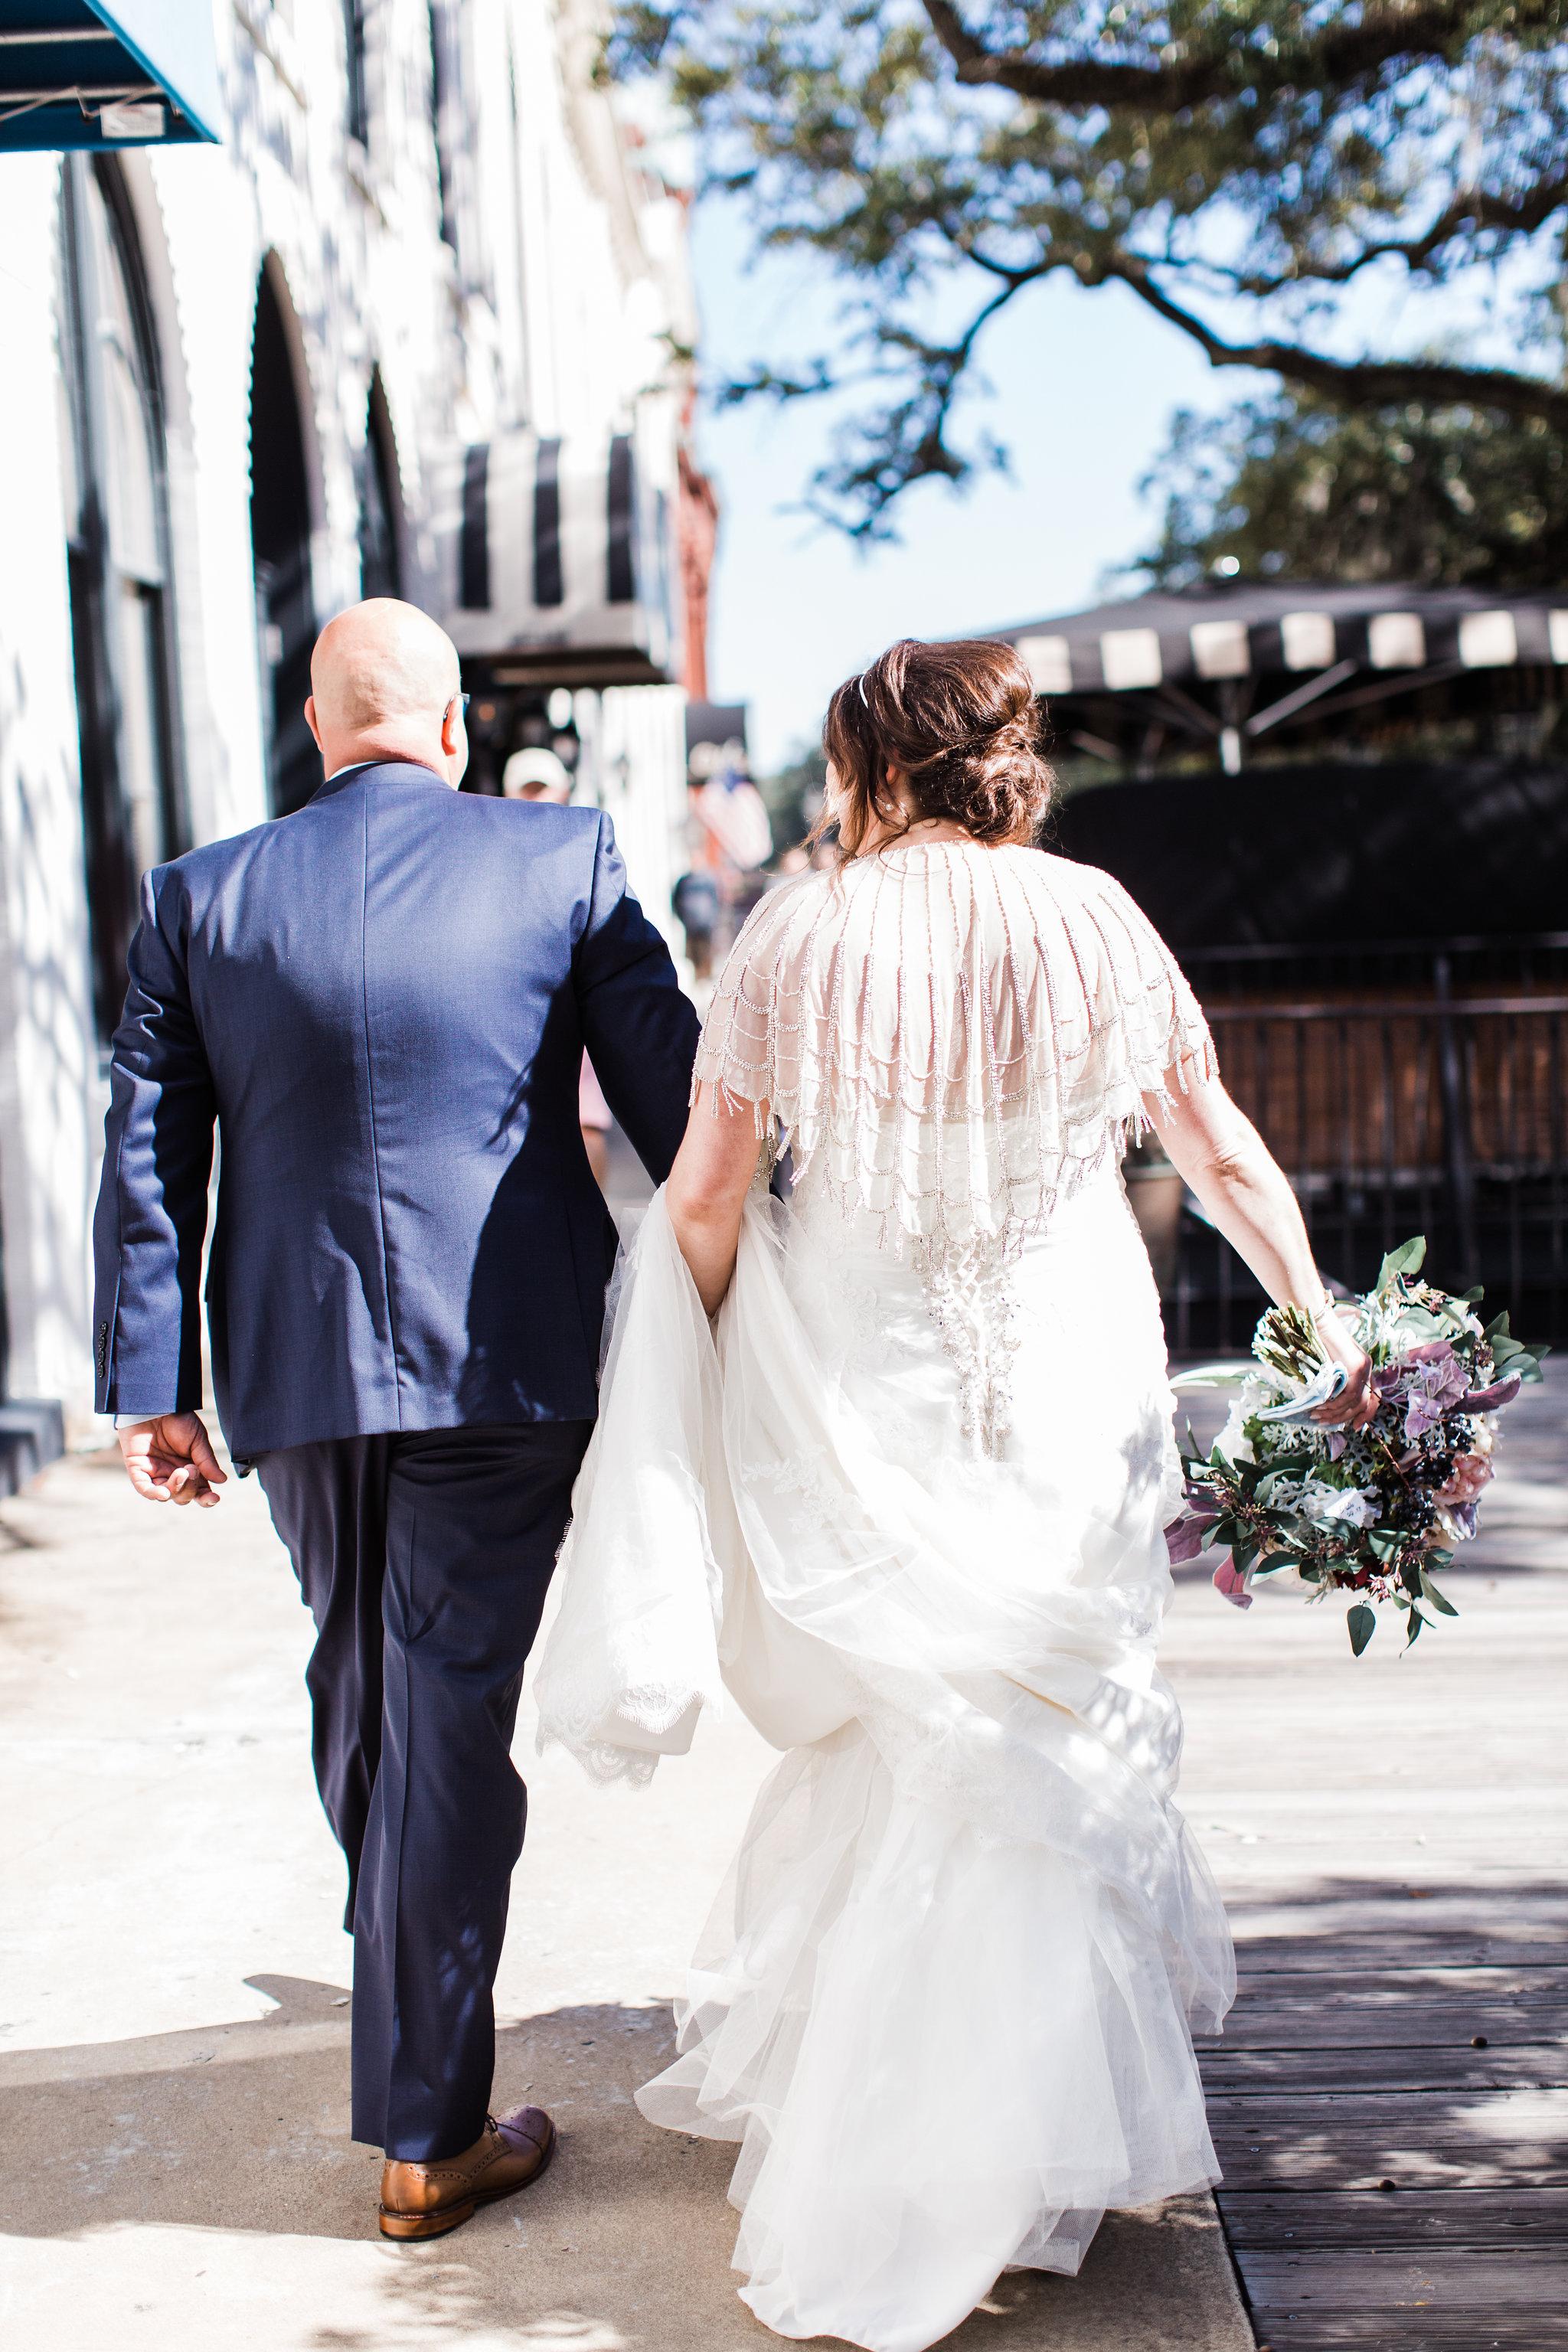 apt-b-photography-kristy-rob-wormsloe-elopment-savannah-wedding-photographer-savannah-elopement-wormsloe-wedding-historic-savannah-14.jpg